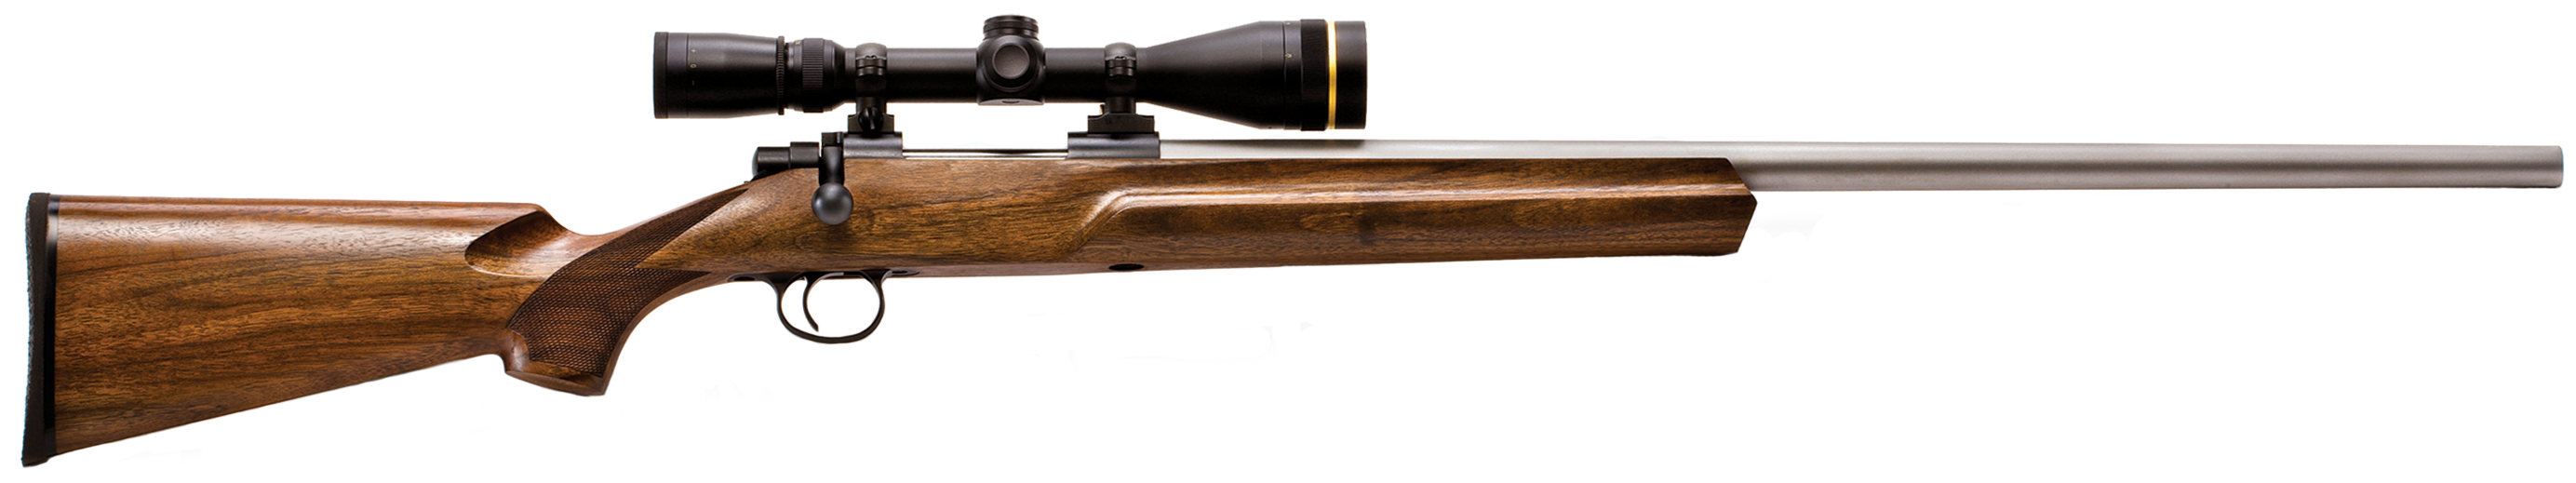 Wooden Sniper PNG Image